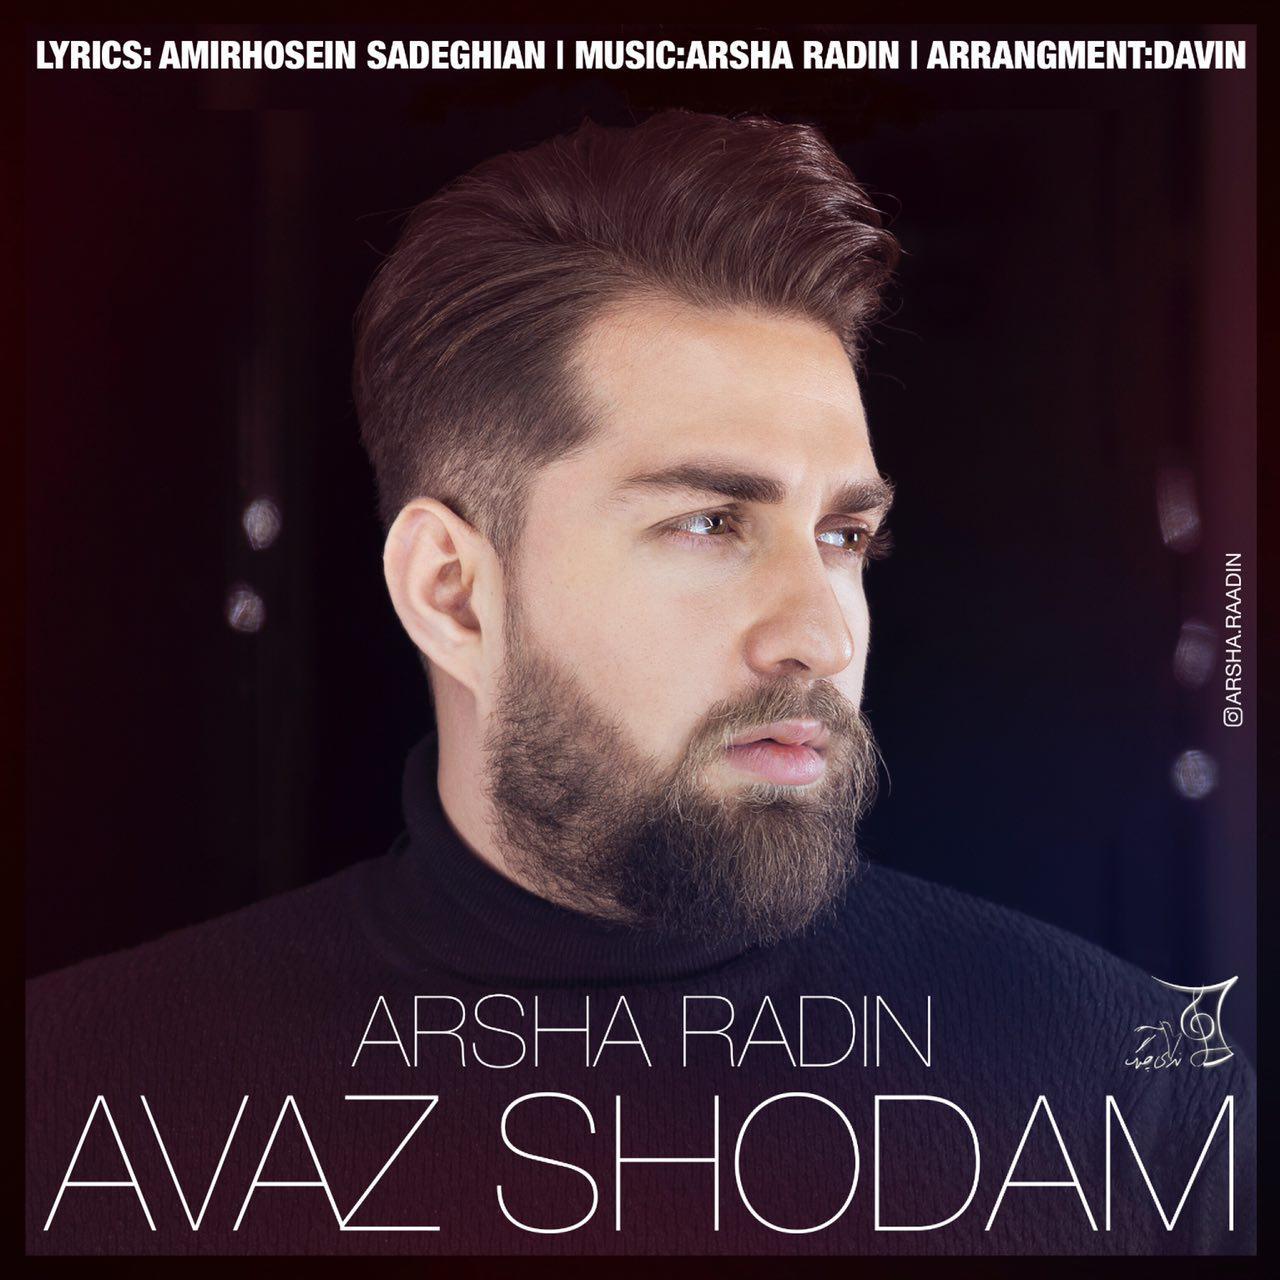 Arsha Radin – Avaz Shodam